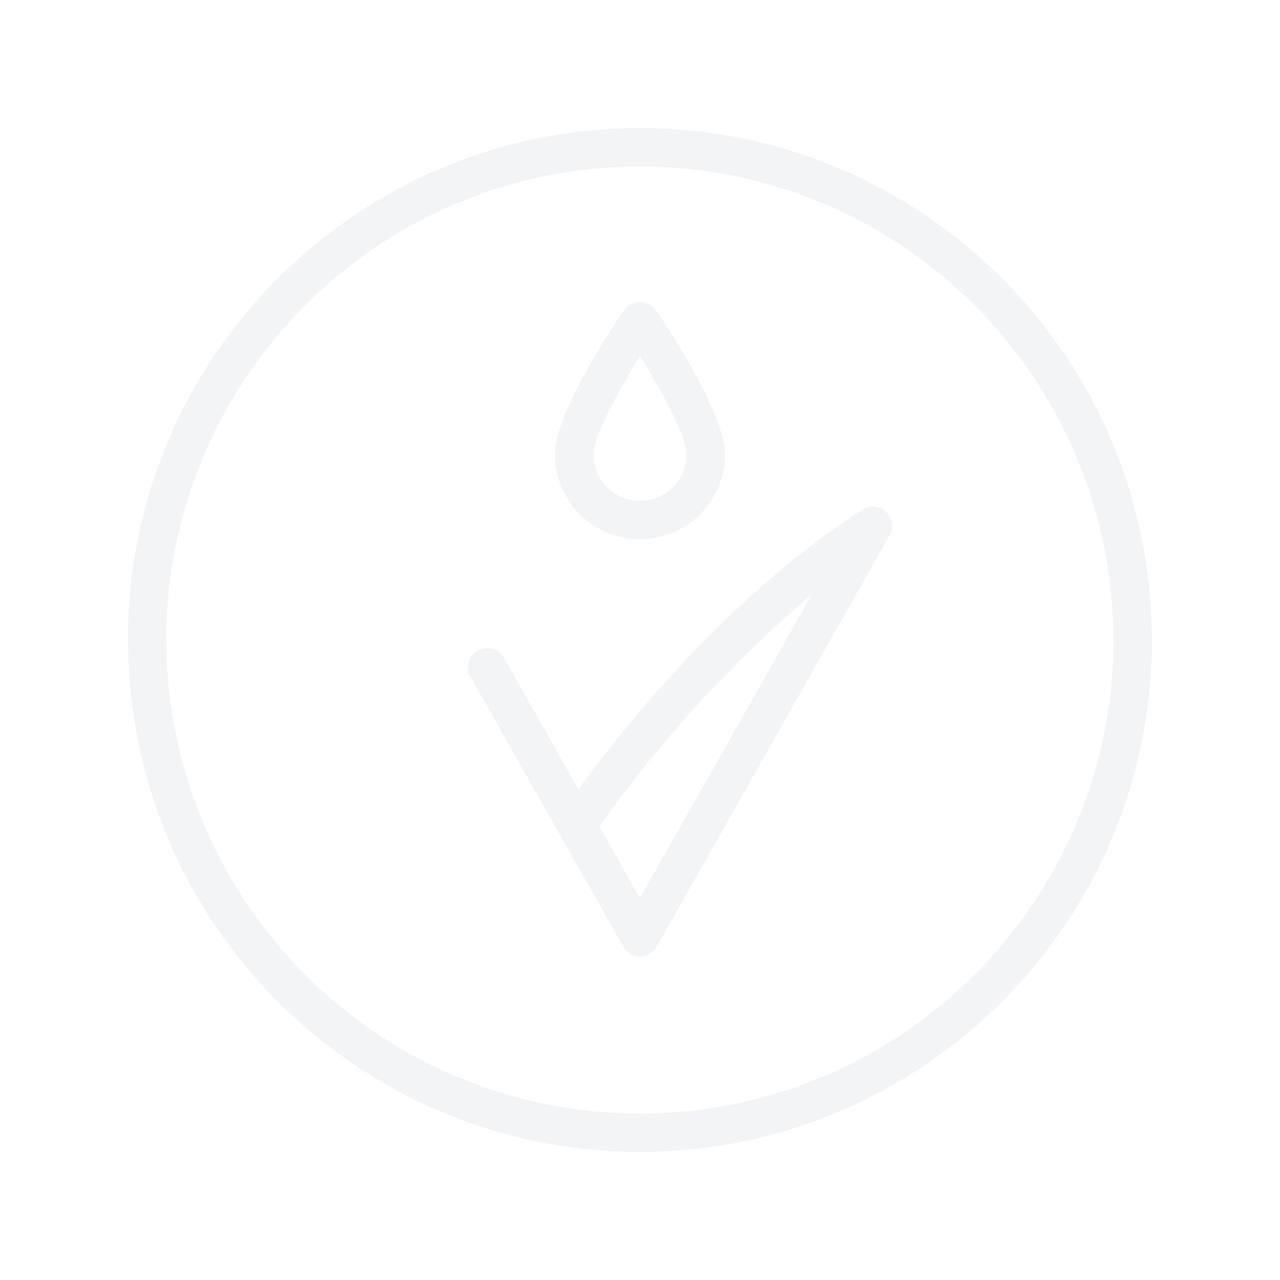 EVERYDAY MINERALS Makeup Diary Waikiki Gift Set